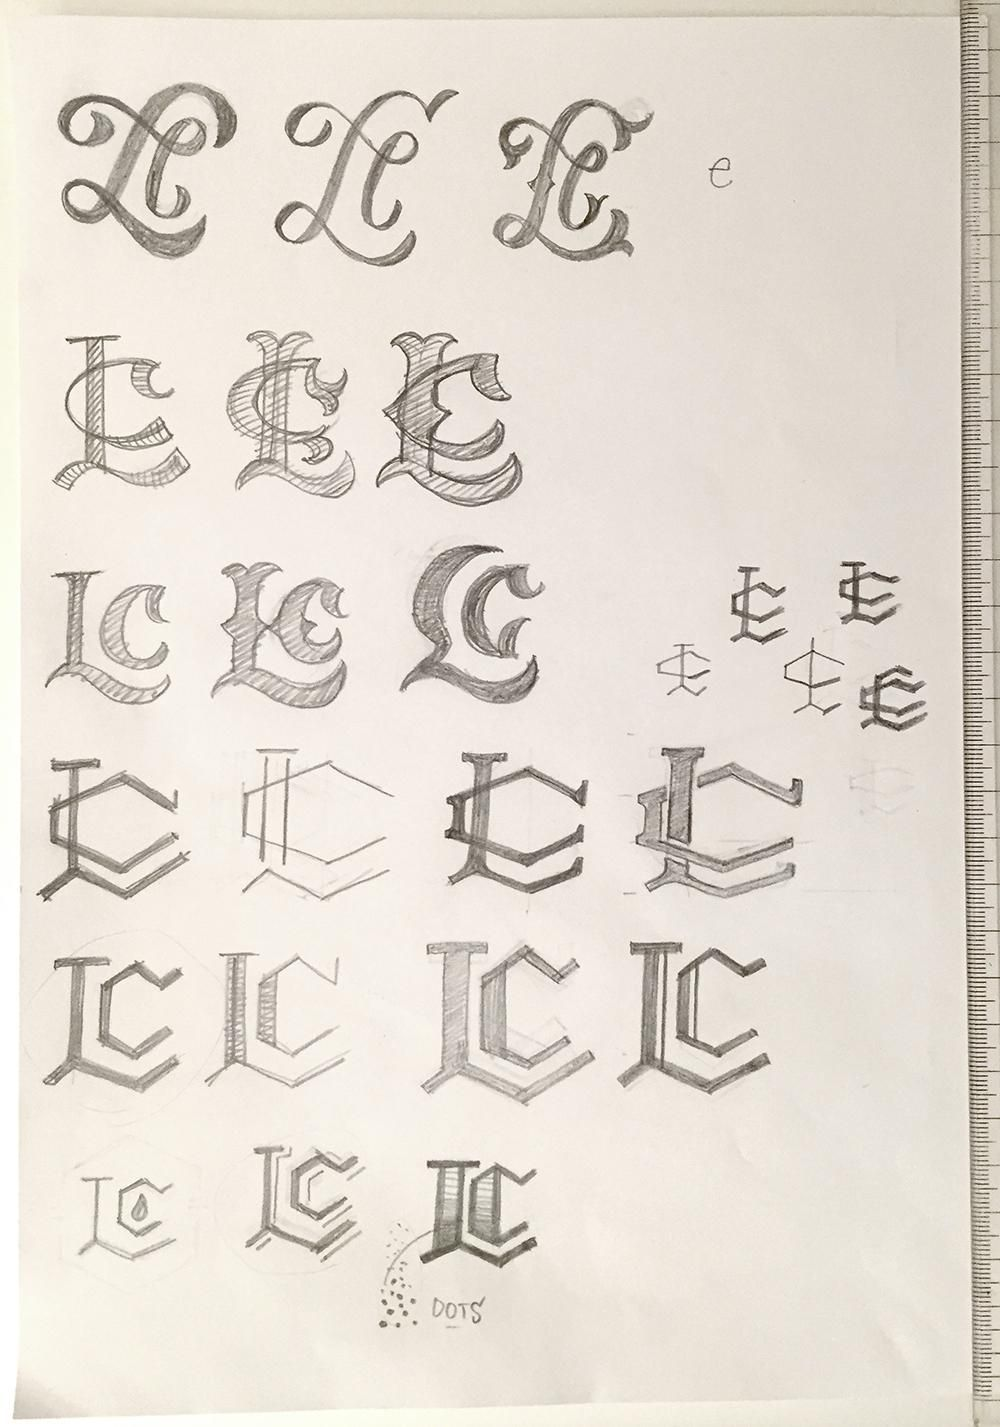 LC Monogram - image 7 - student project